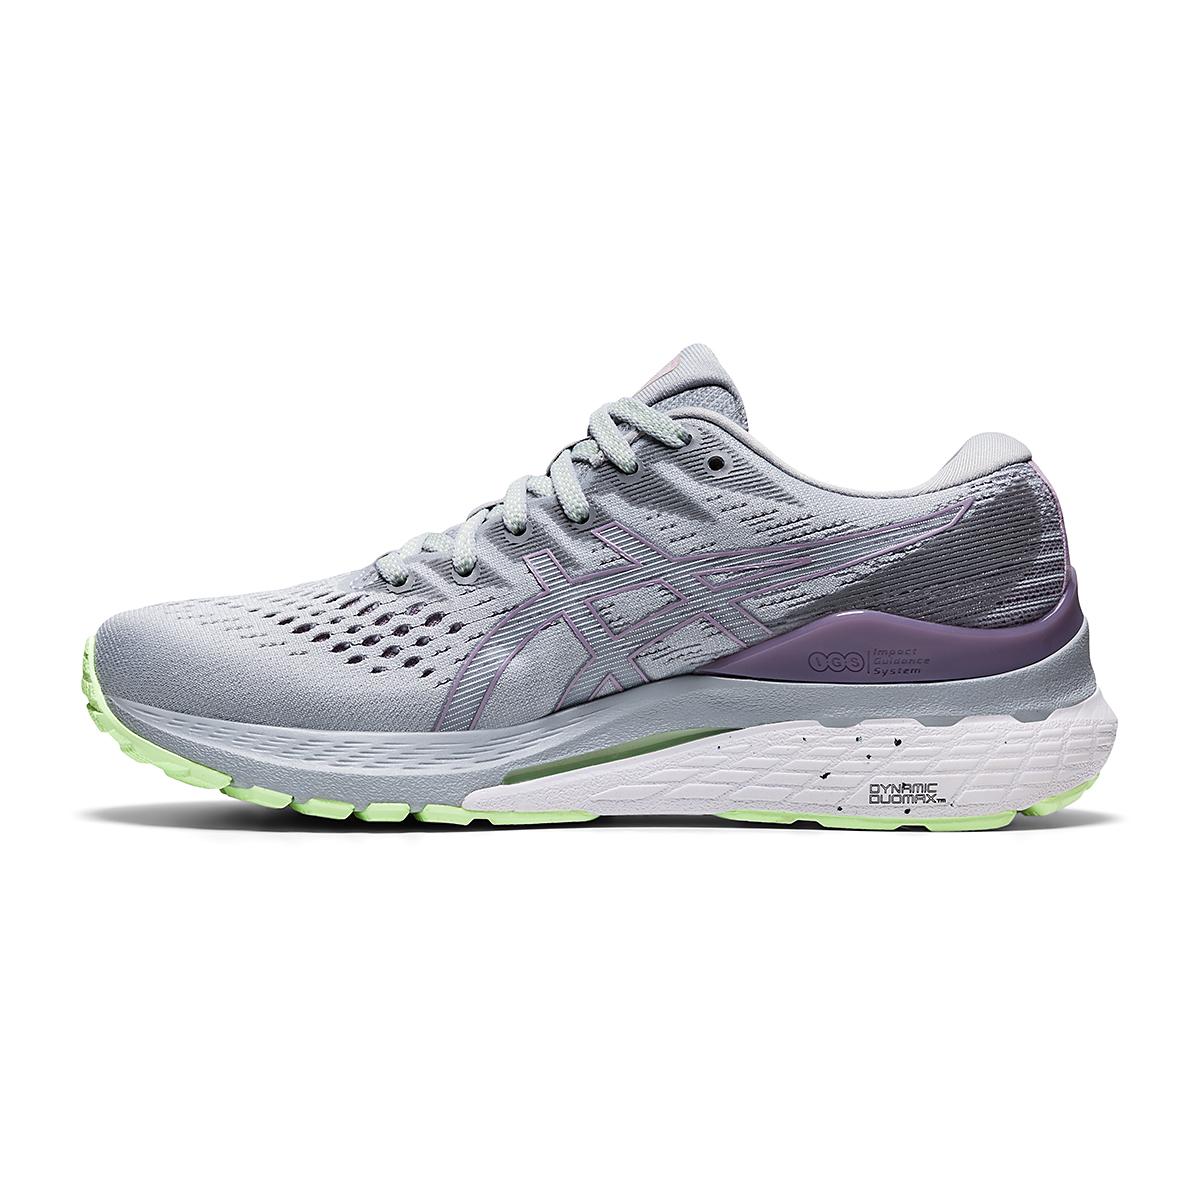 Women's Asics Gel-Kayano 28 Running Shoe - Color: Piedmont Grey/Lavender - Size: 5 - Width: Regular, Piedmont Grey/Lavender, large, image 2